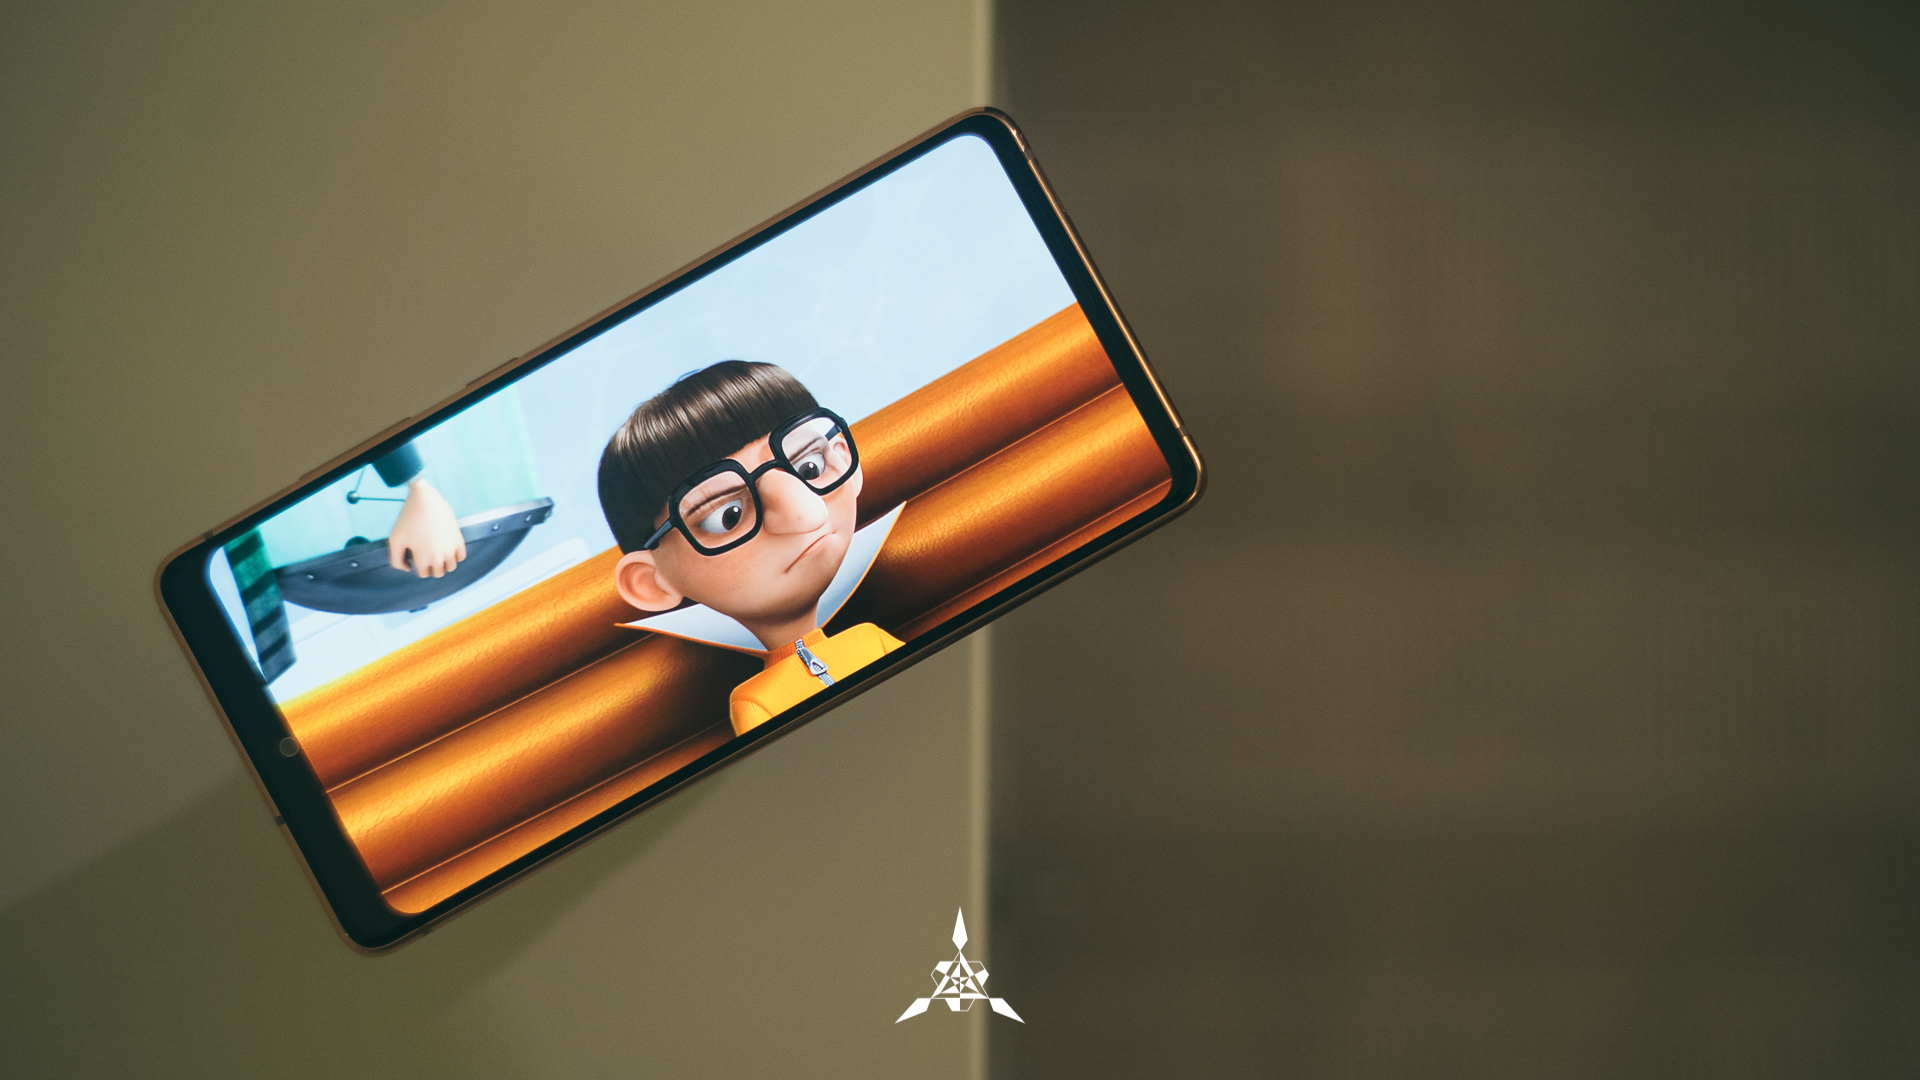 http://server.digimetriq.com/wp-content/uploads/2020/12/1607556490_37_Samsung-Galaxy-S20-FE-Review-We-Want-One.jpg